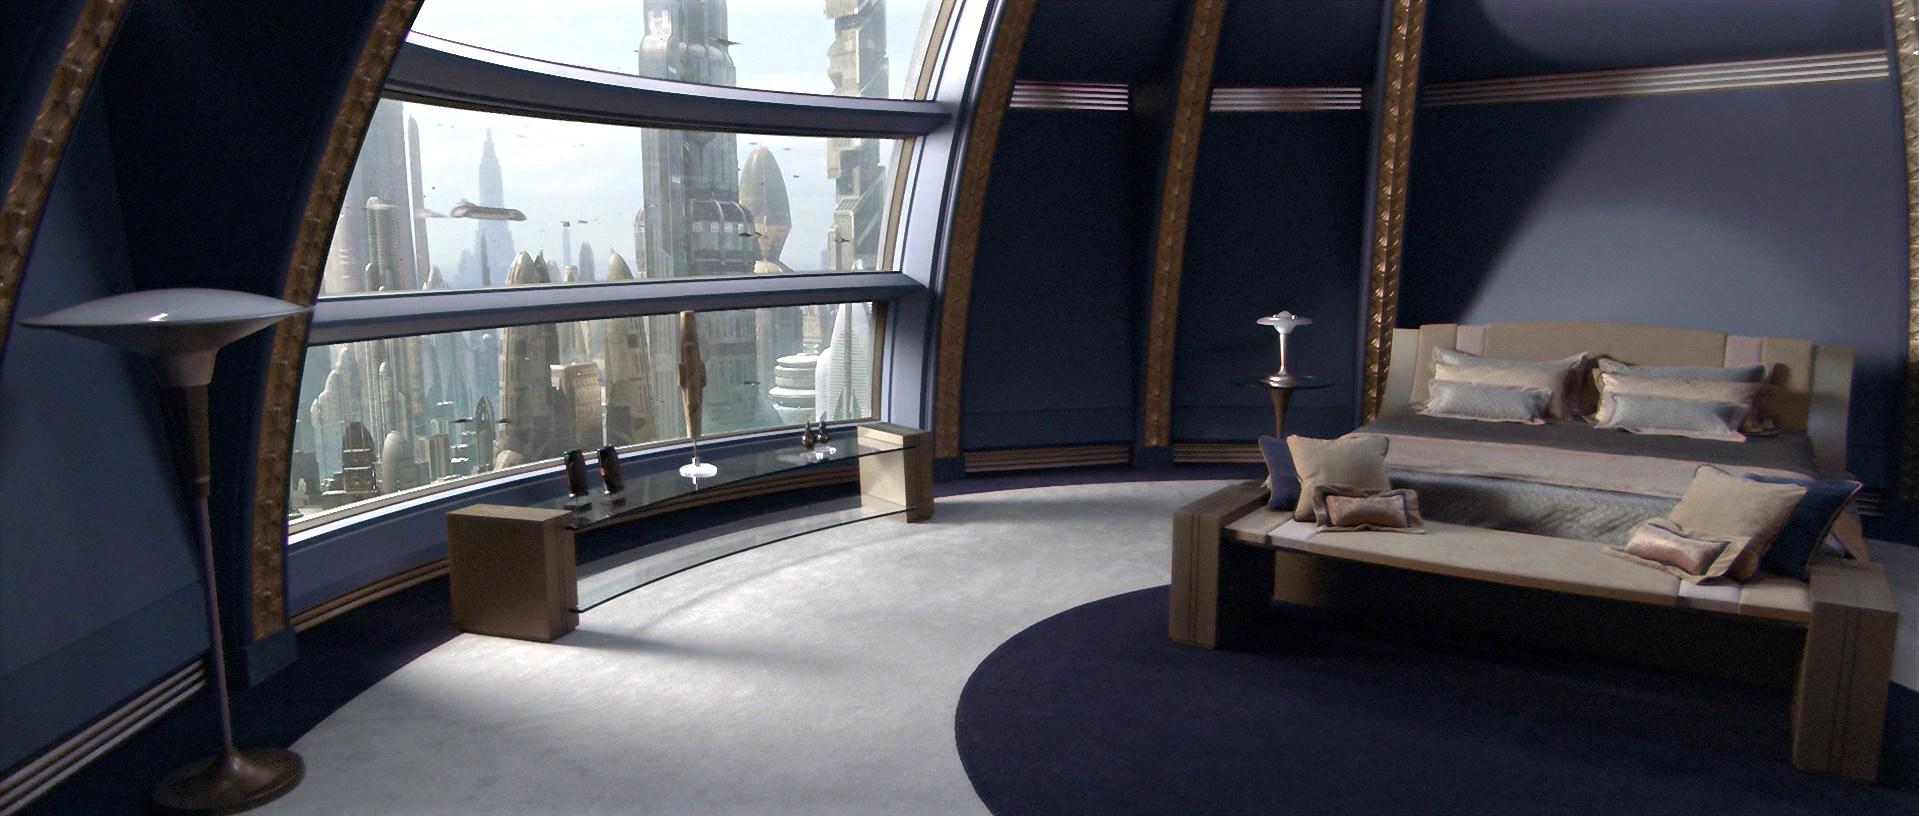 Padme Amidalas apartment